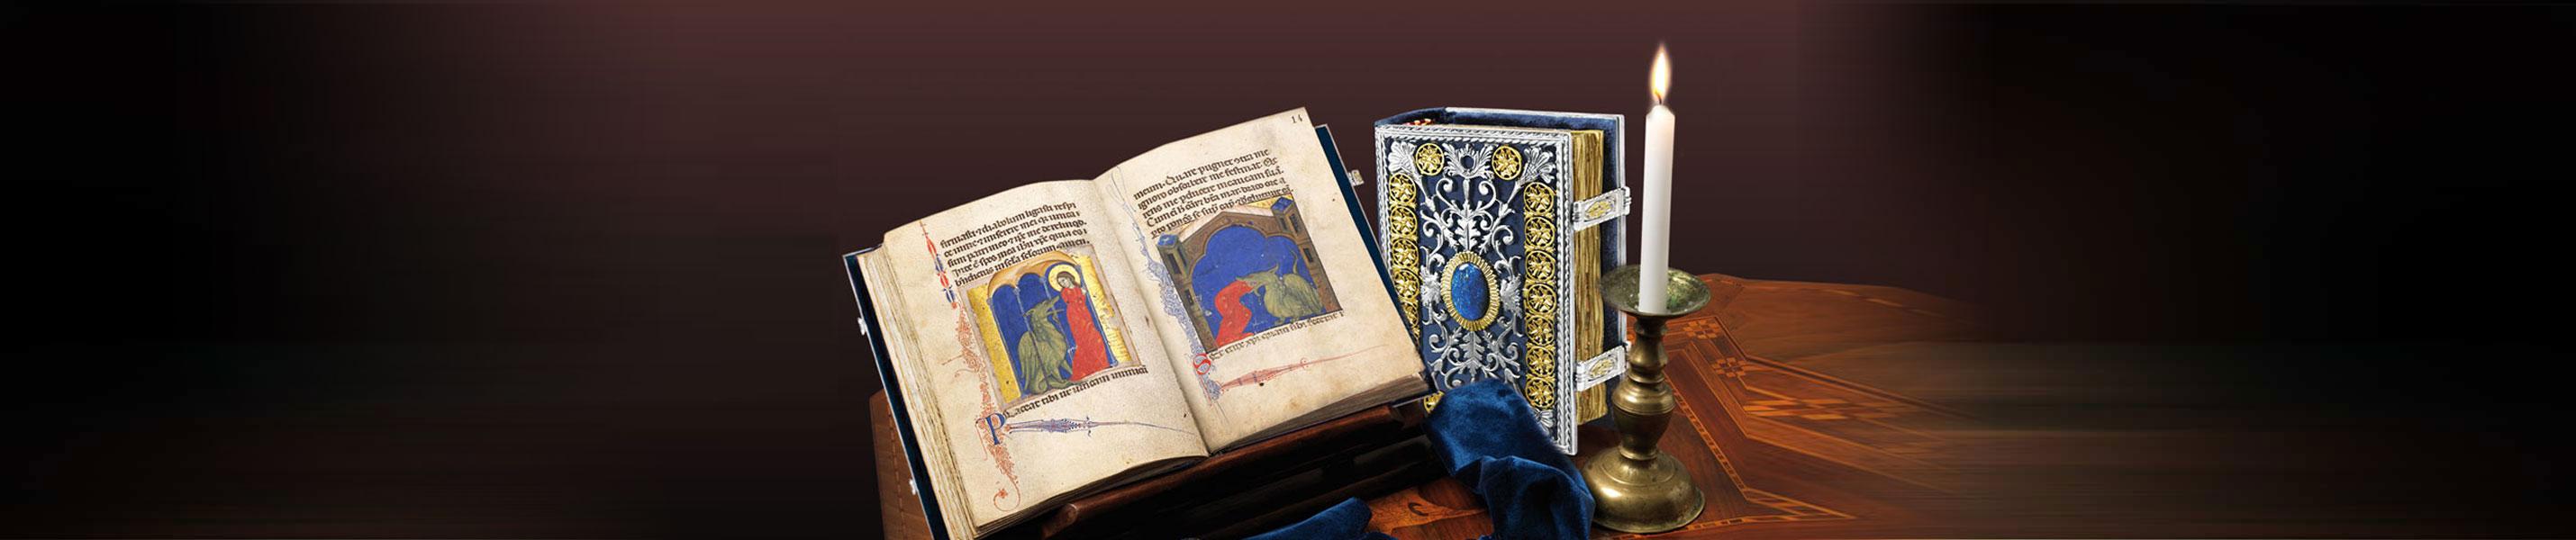 La Leggenda di Santa Margherita – ArtCodex